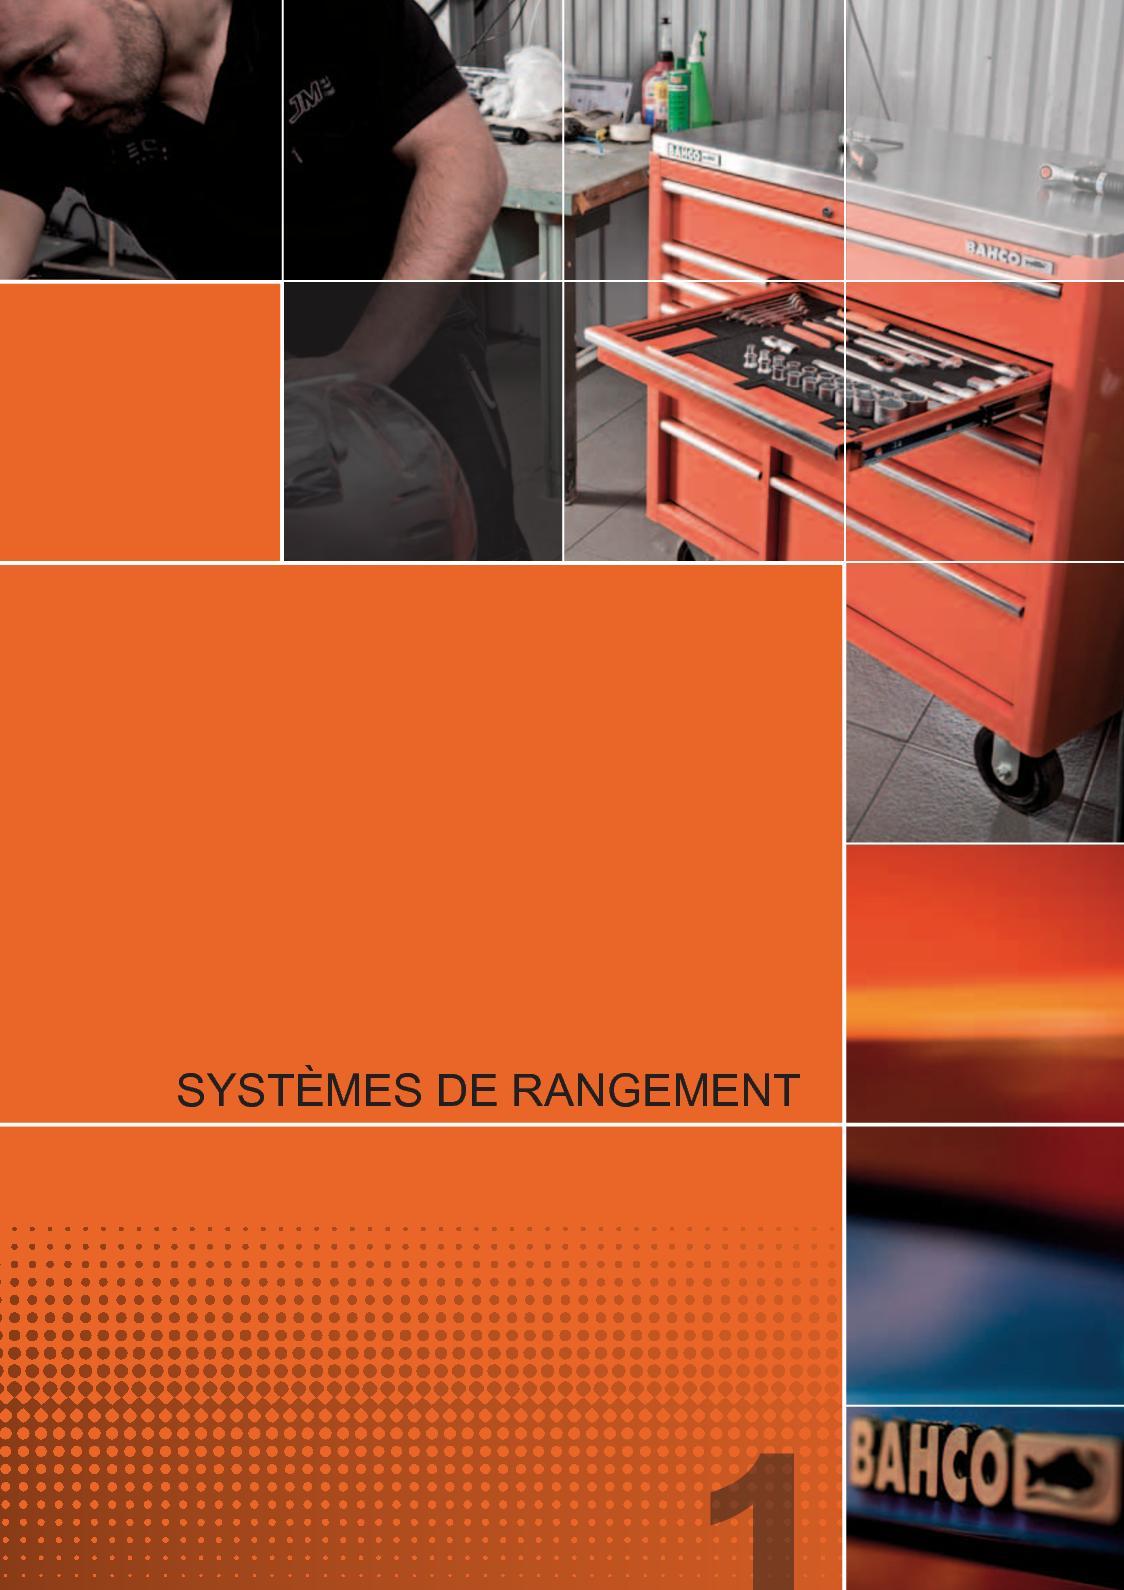 Bahco ERGO Combinaison Pinces Série 2628 G Range